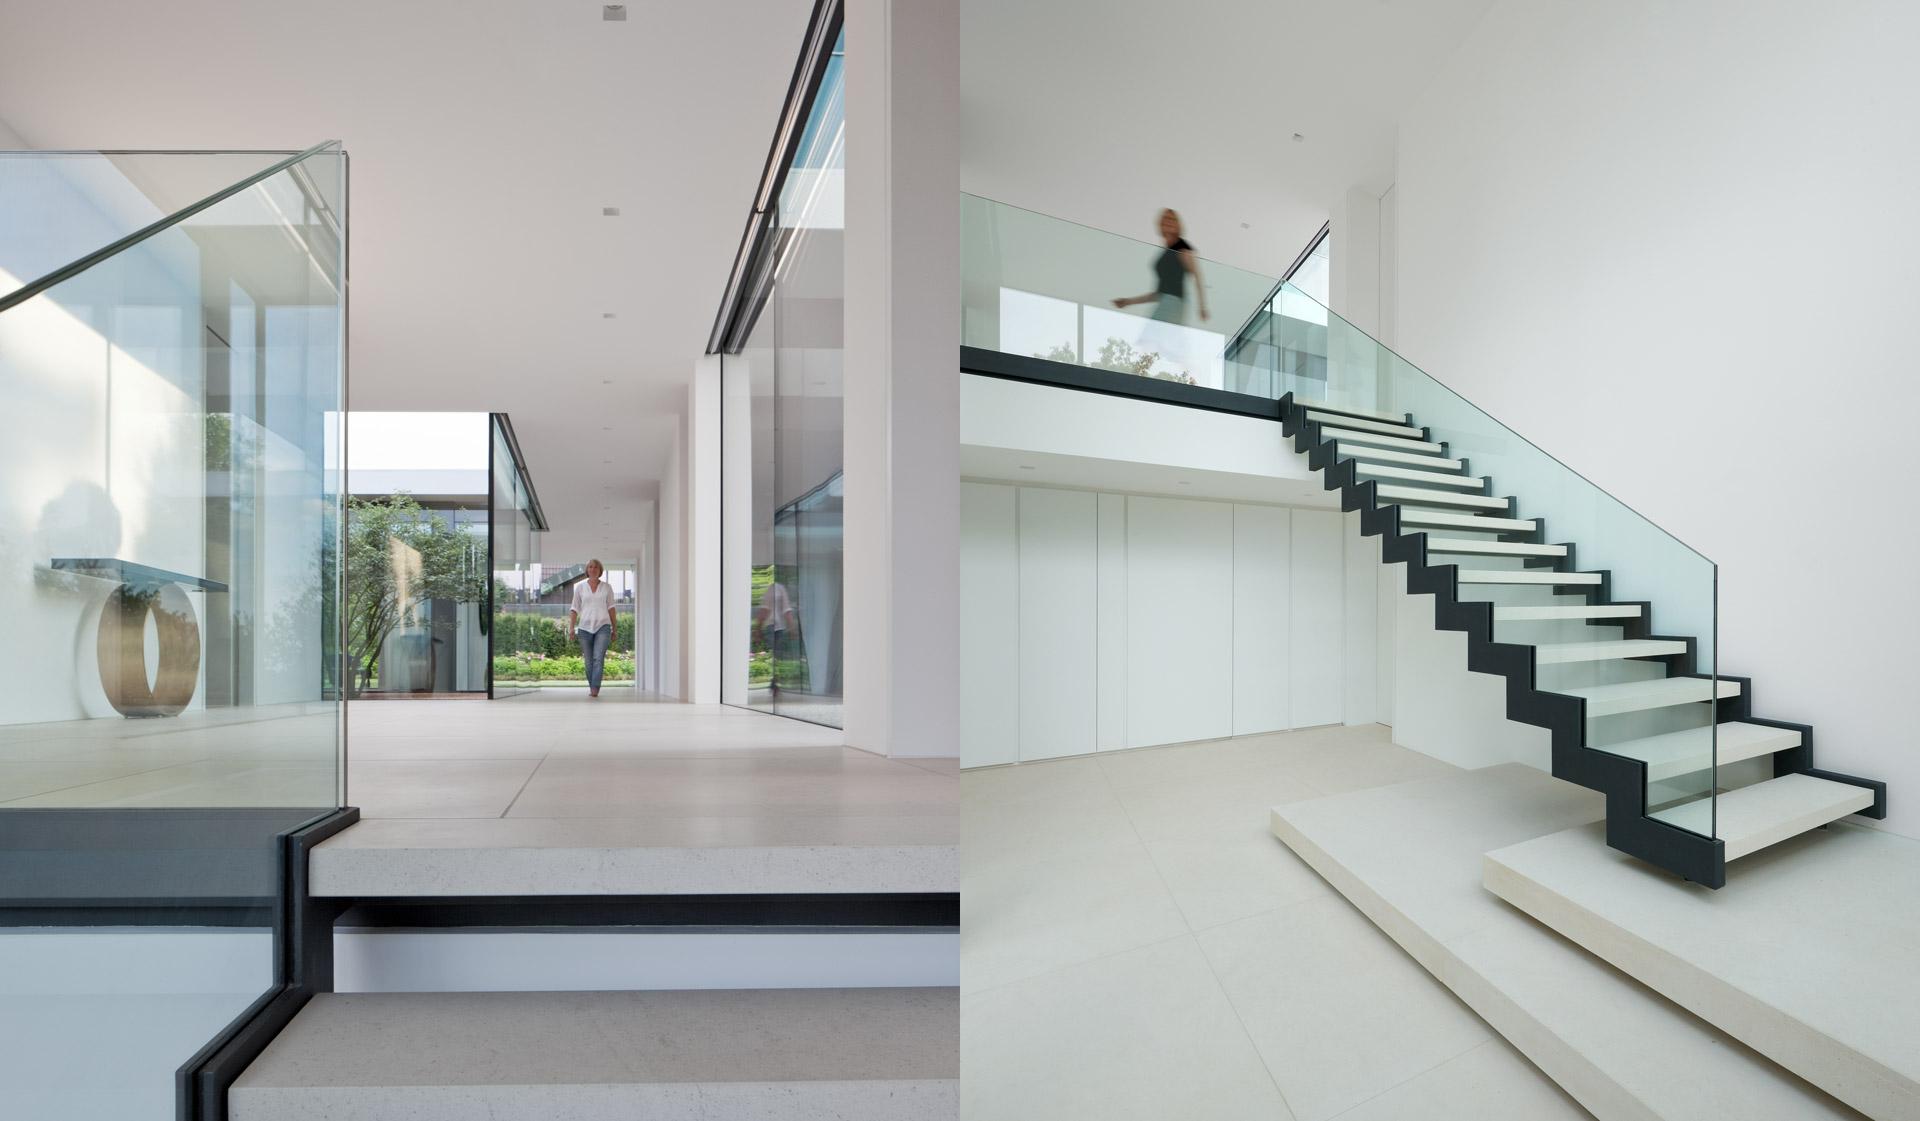 PavillonVilla in Bayern Weber Hummel Architekten 6